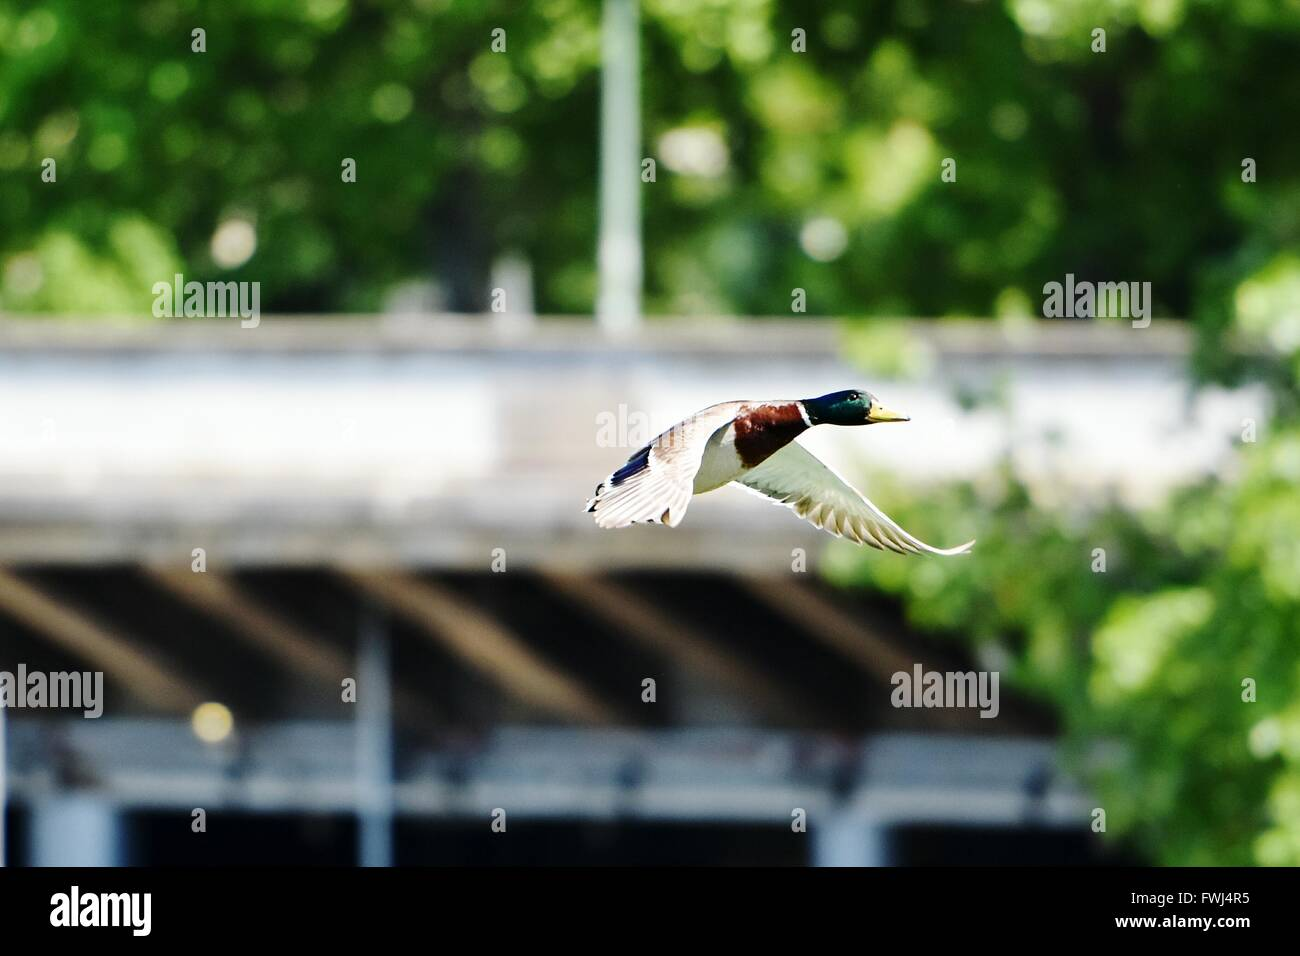 Mallard Duck Flying In Mid-Air - Stock Image